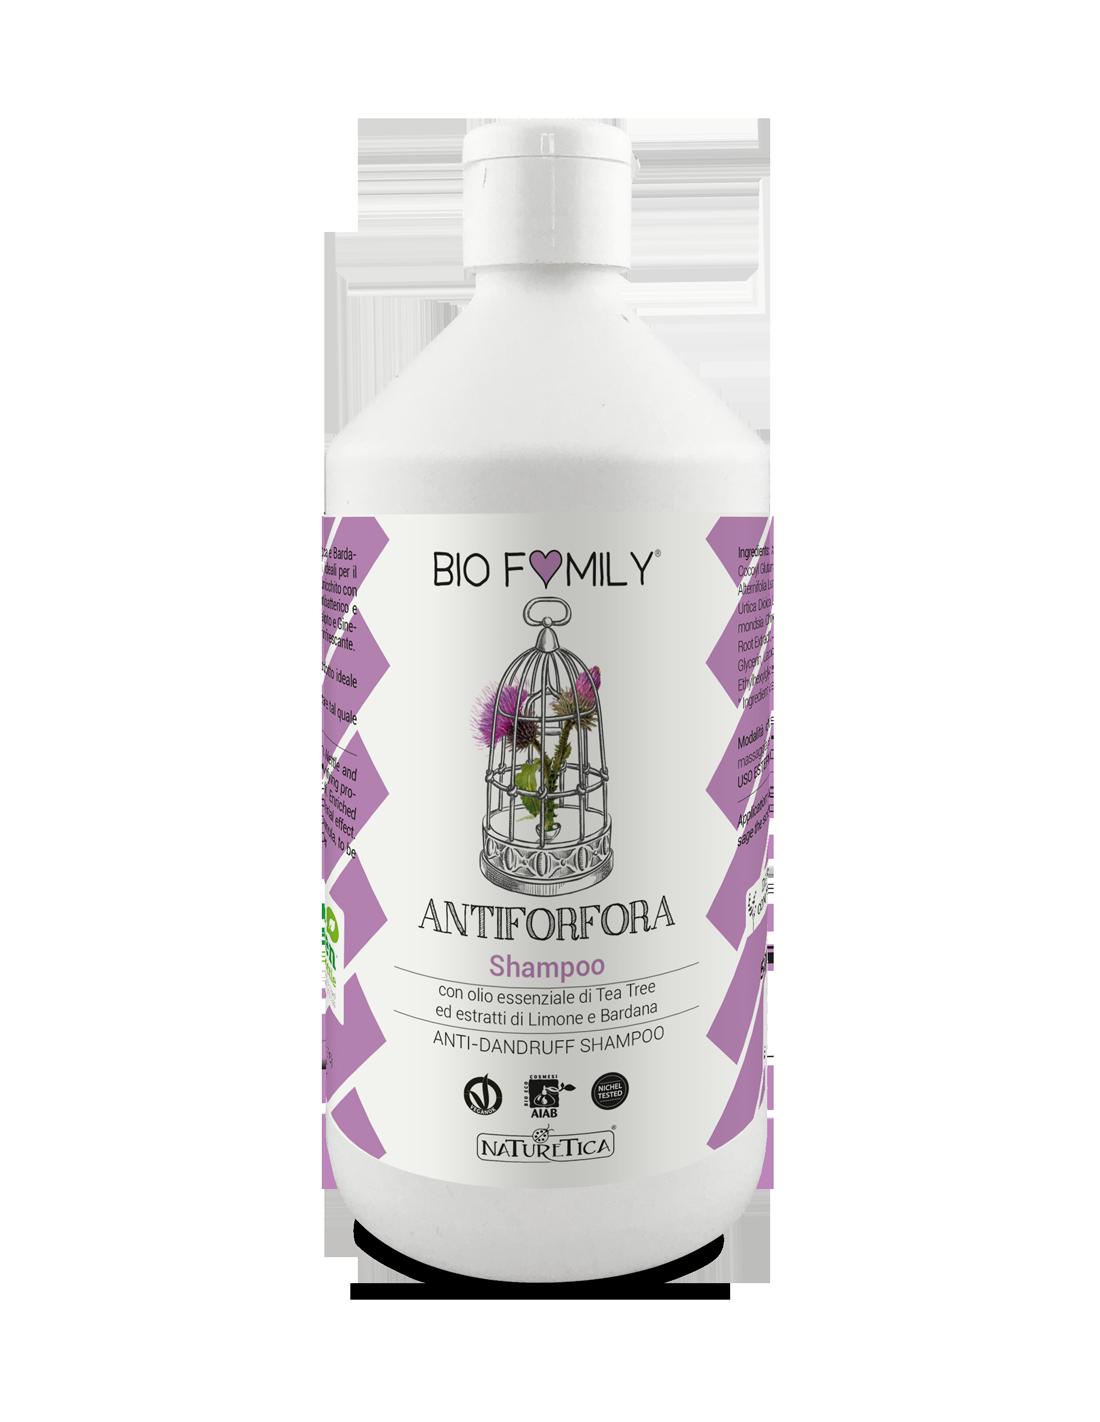 BioFamily Shampoo Antiforfora